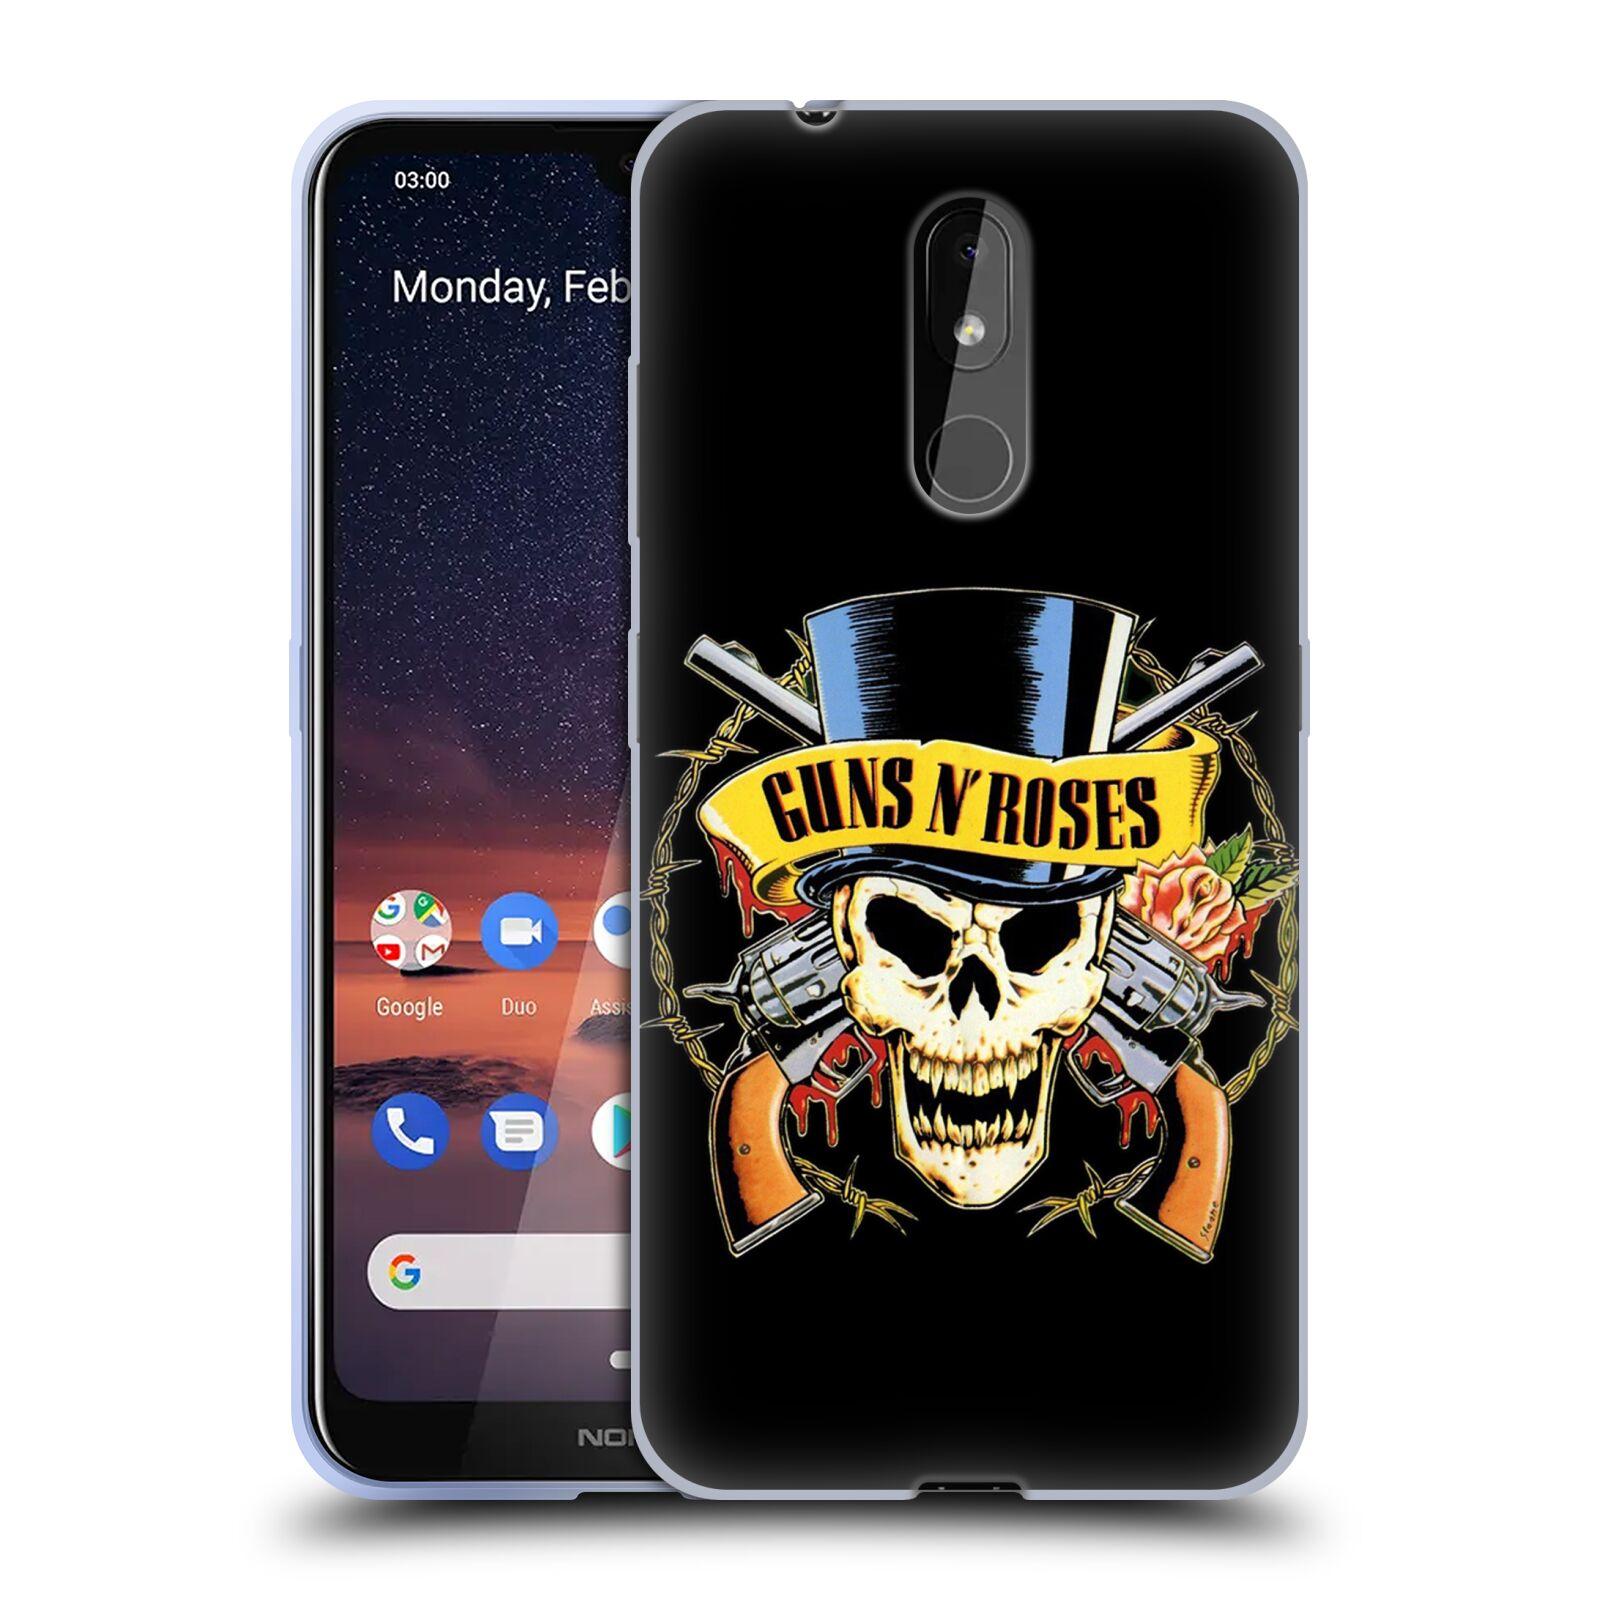 Silikonové pouzdro na mobil Nokia 3.2 - Head Case - Guns N' Roses - Lebka